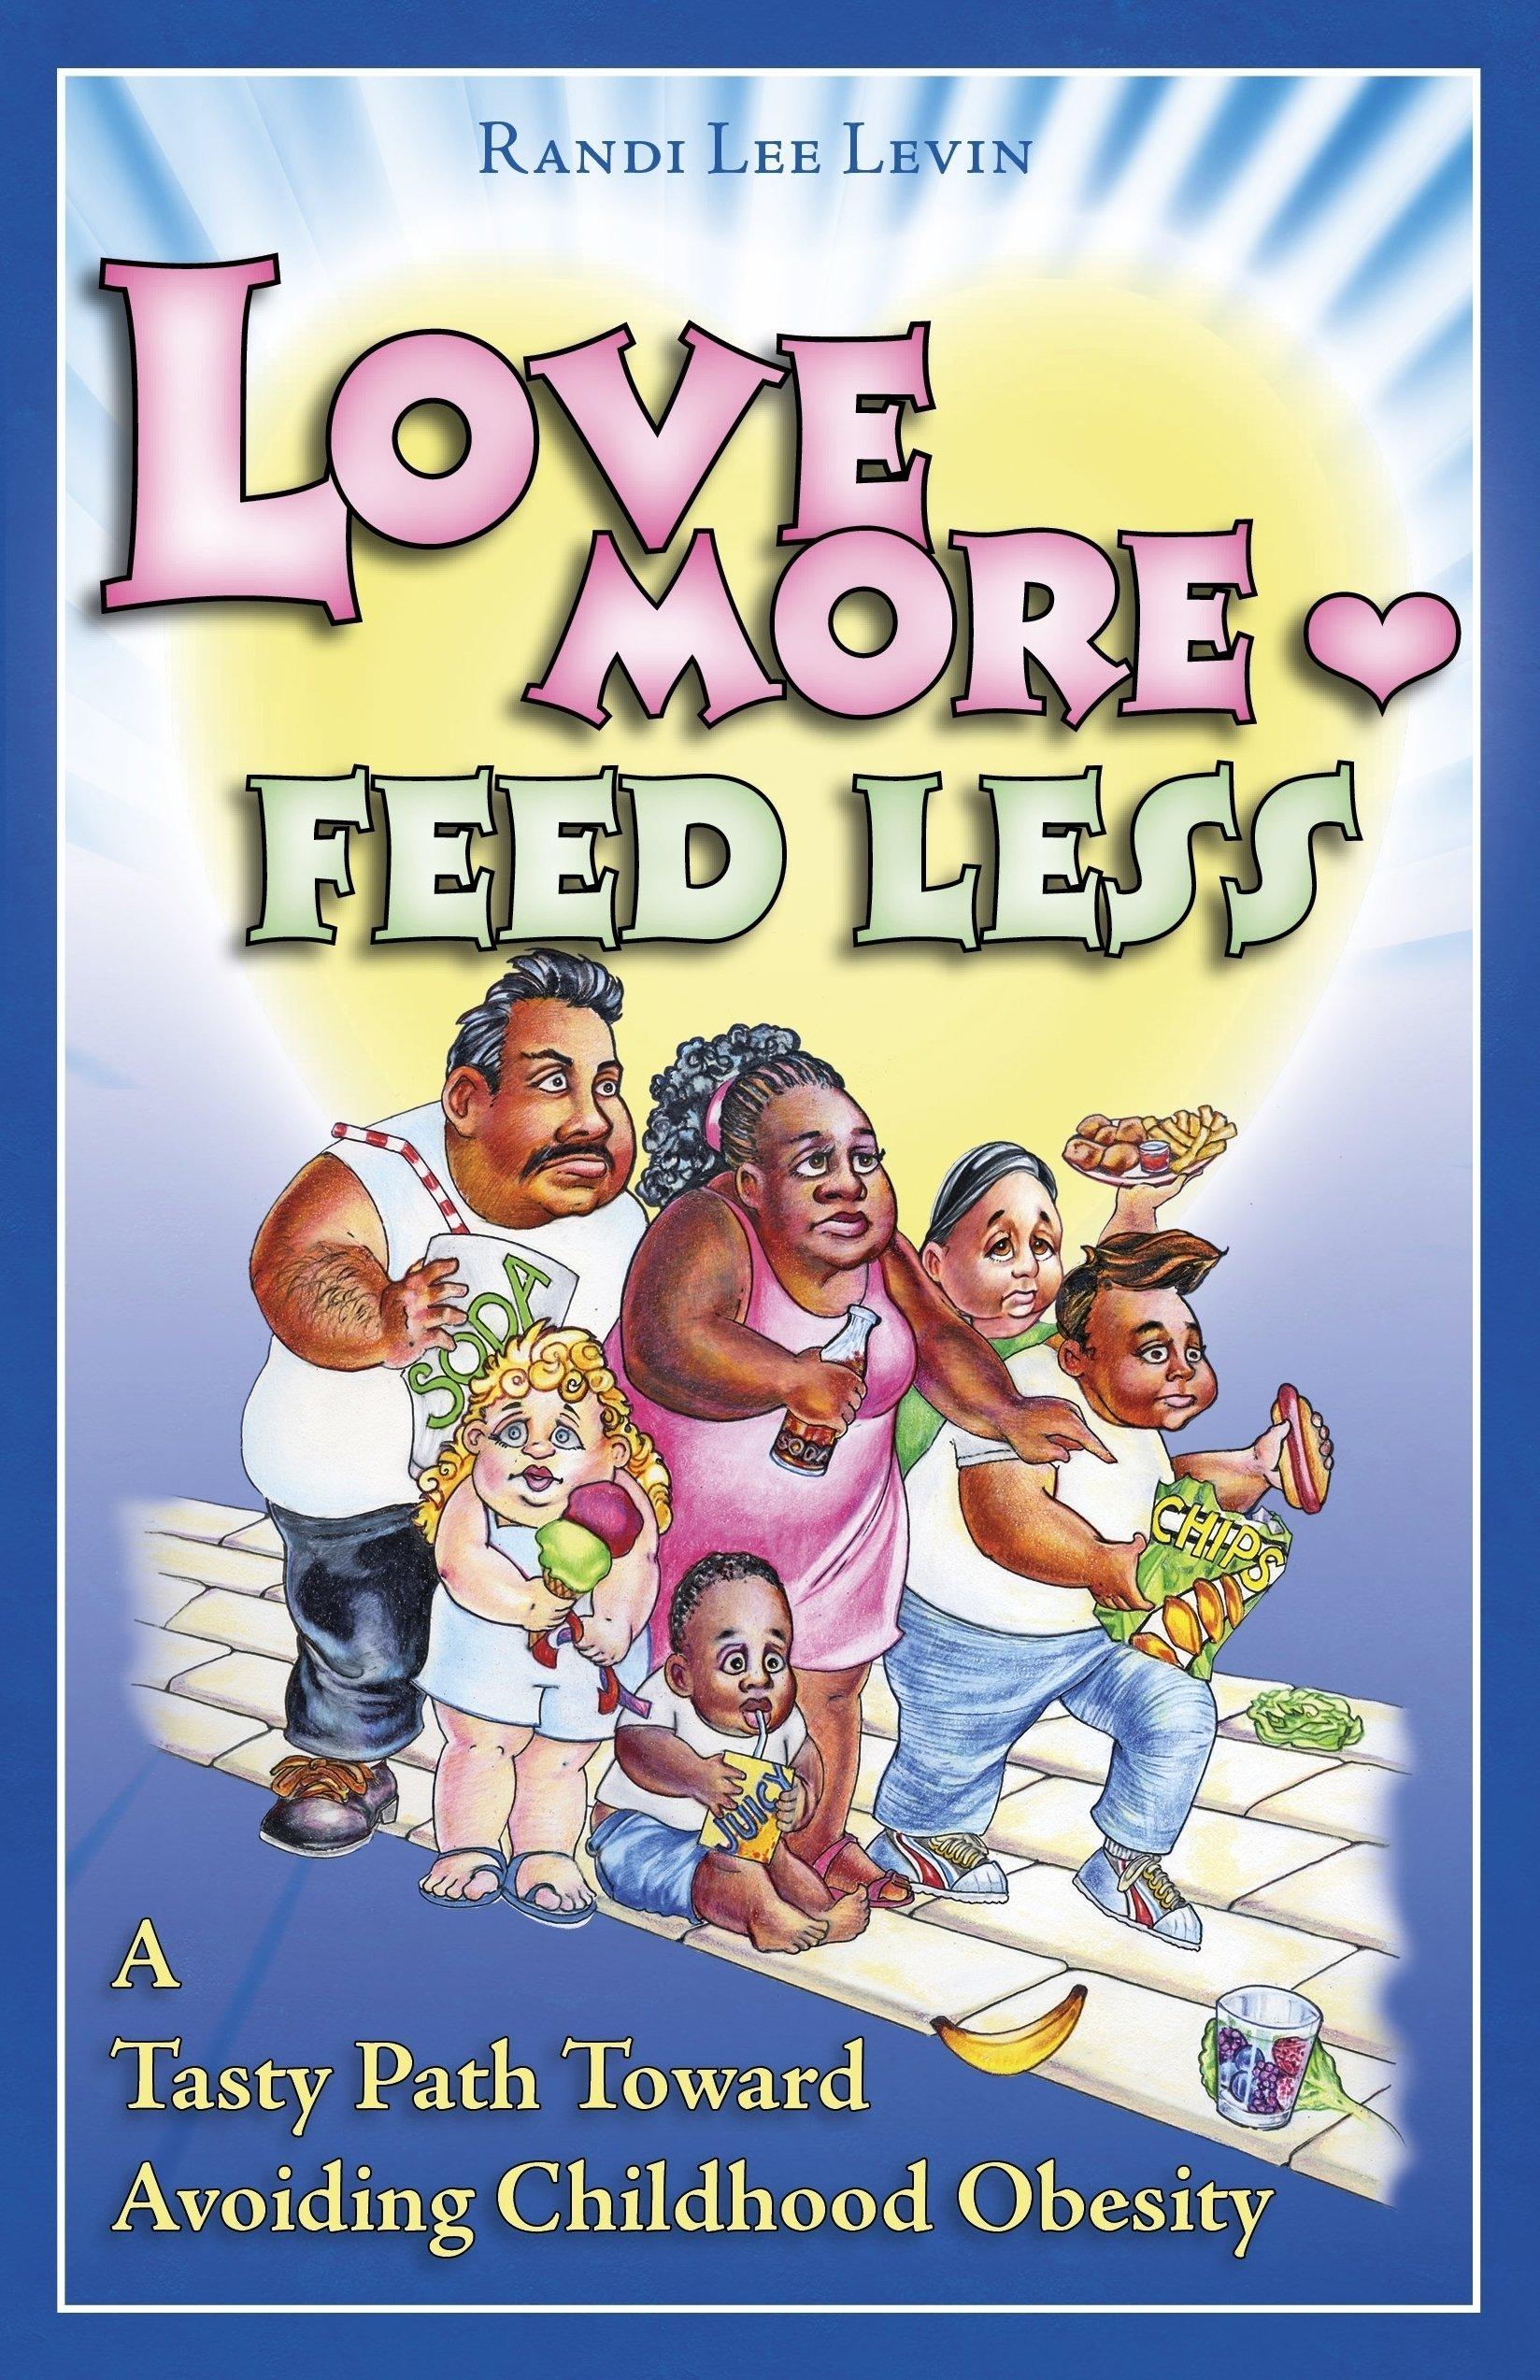 Love More Feed Less A Tasty Path Toward Avoiding Childhood Obesity PDF